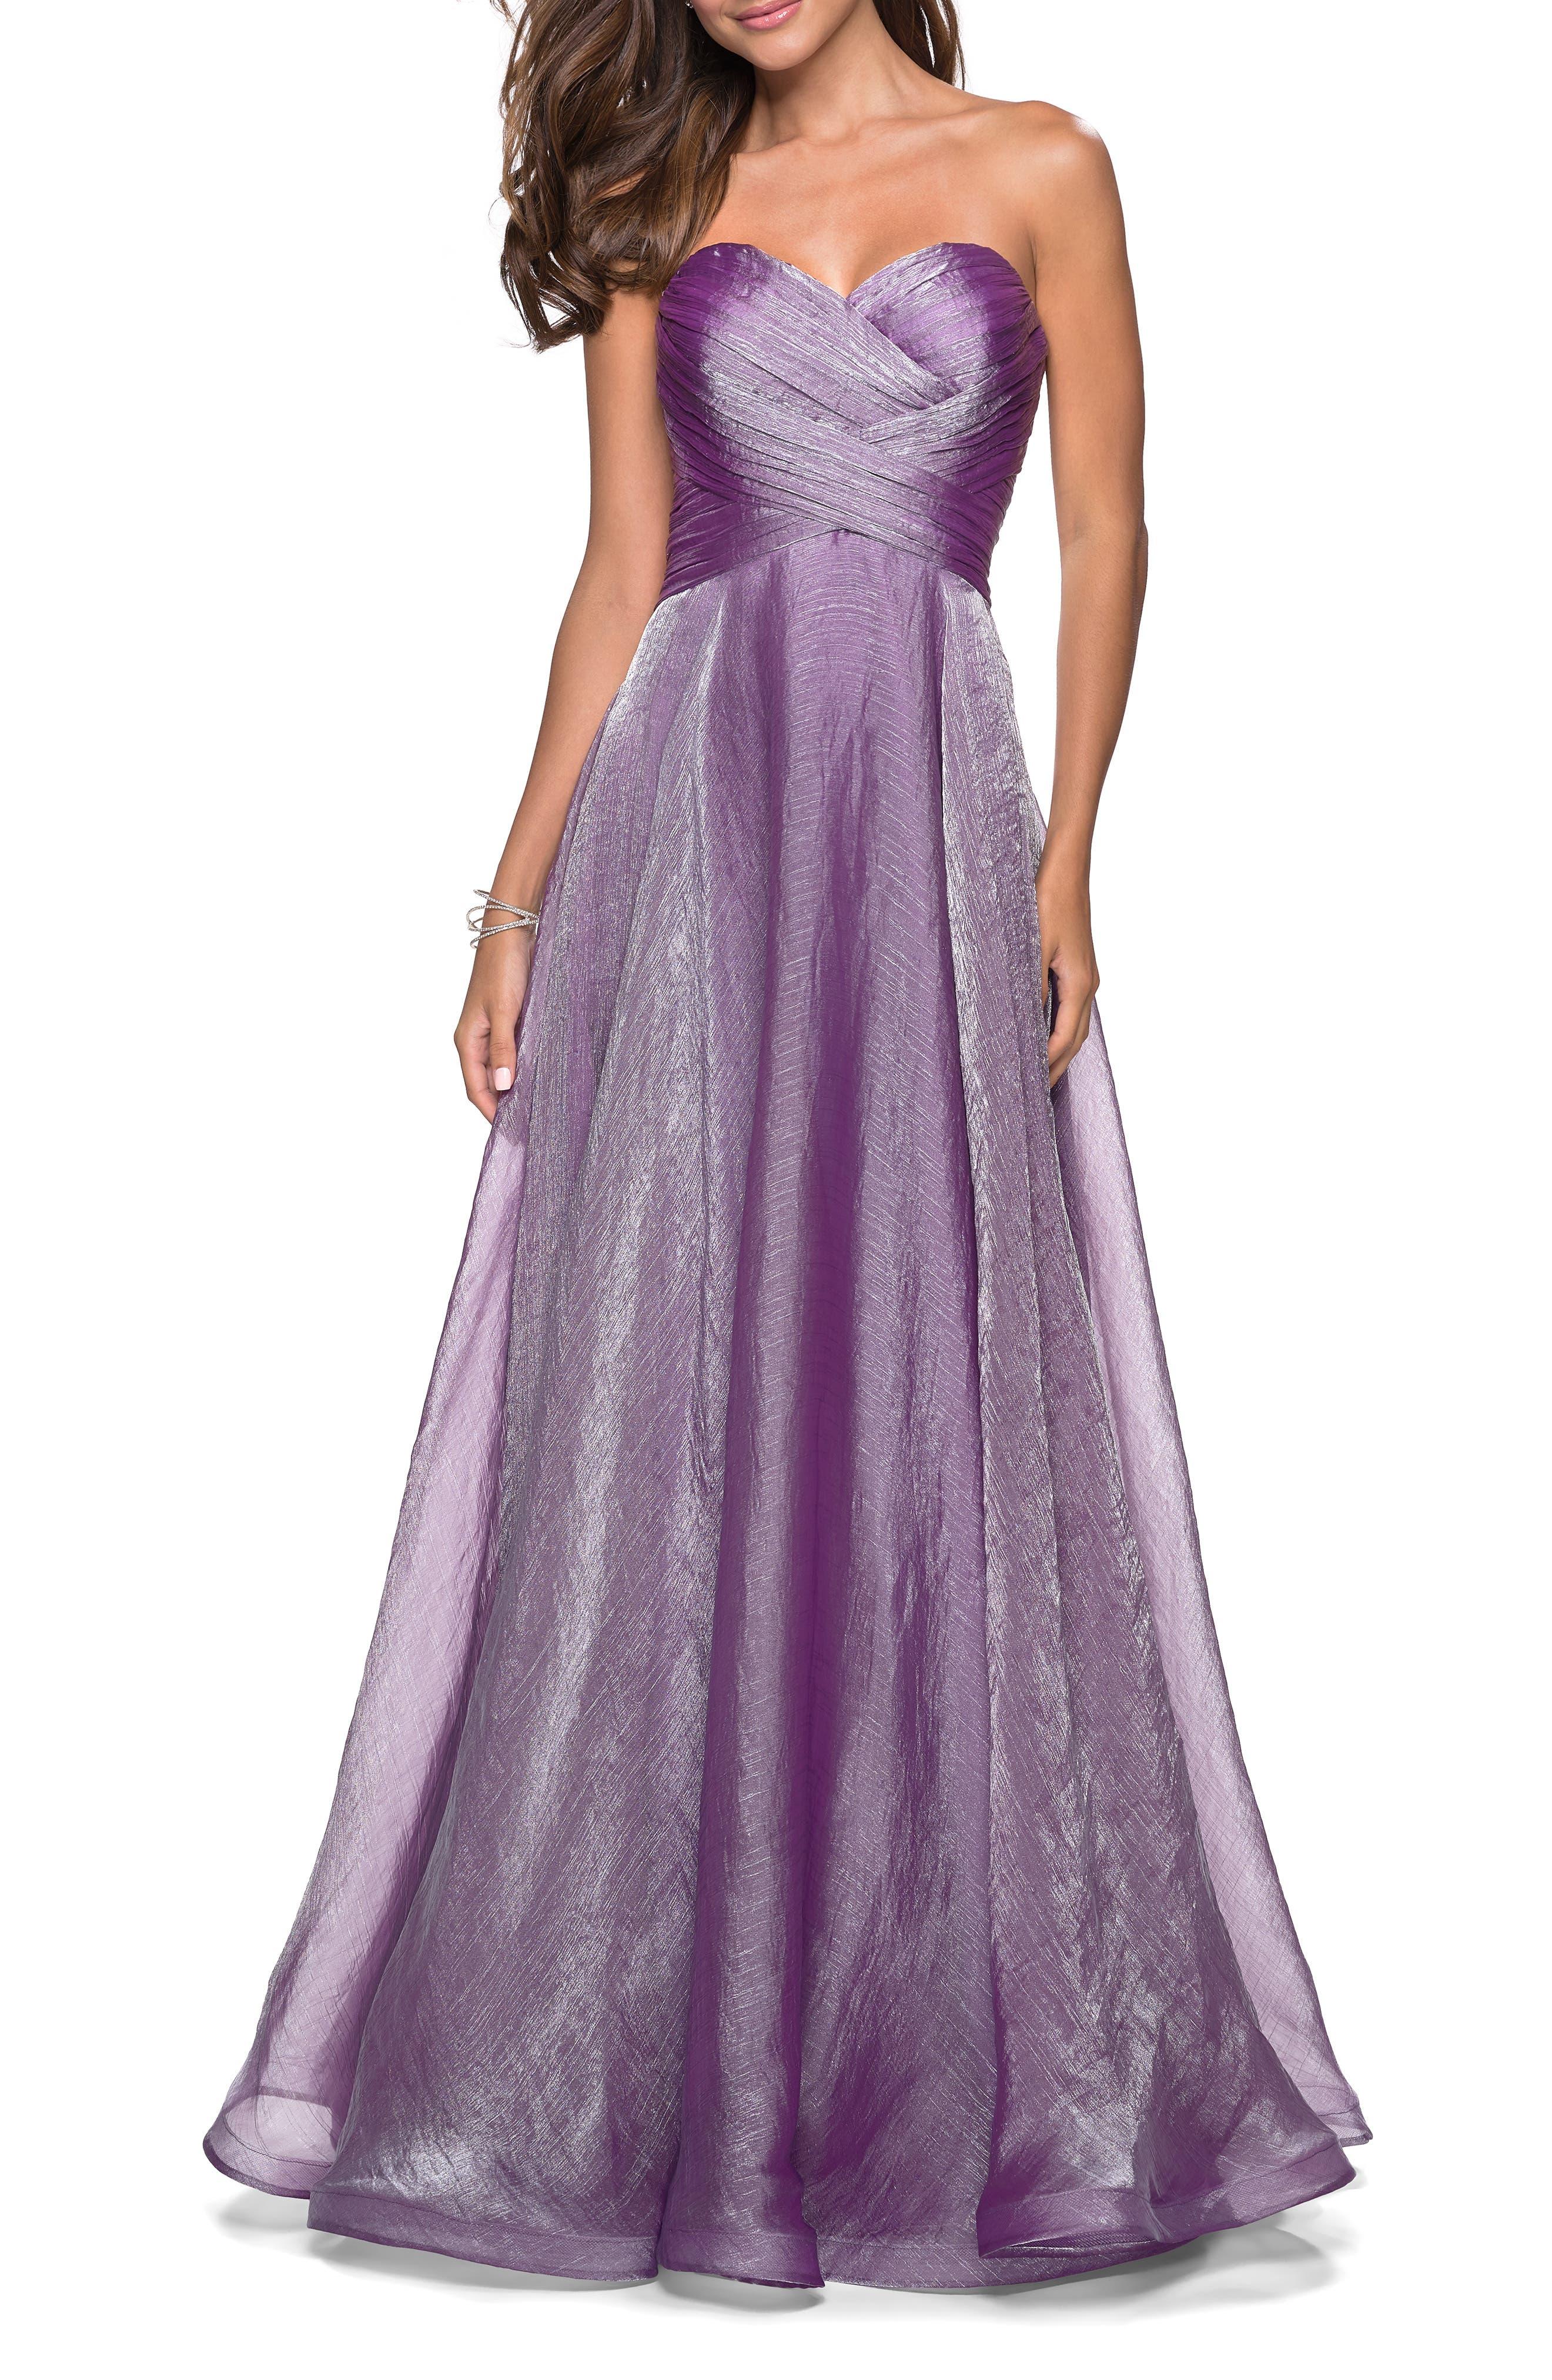 La Femme Strapless Metallic Chiffon Evening Dress, Purple